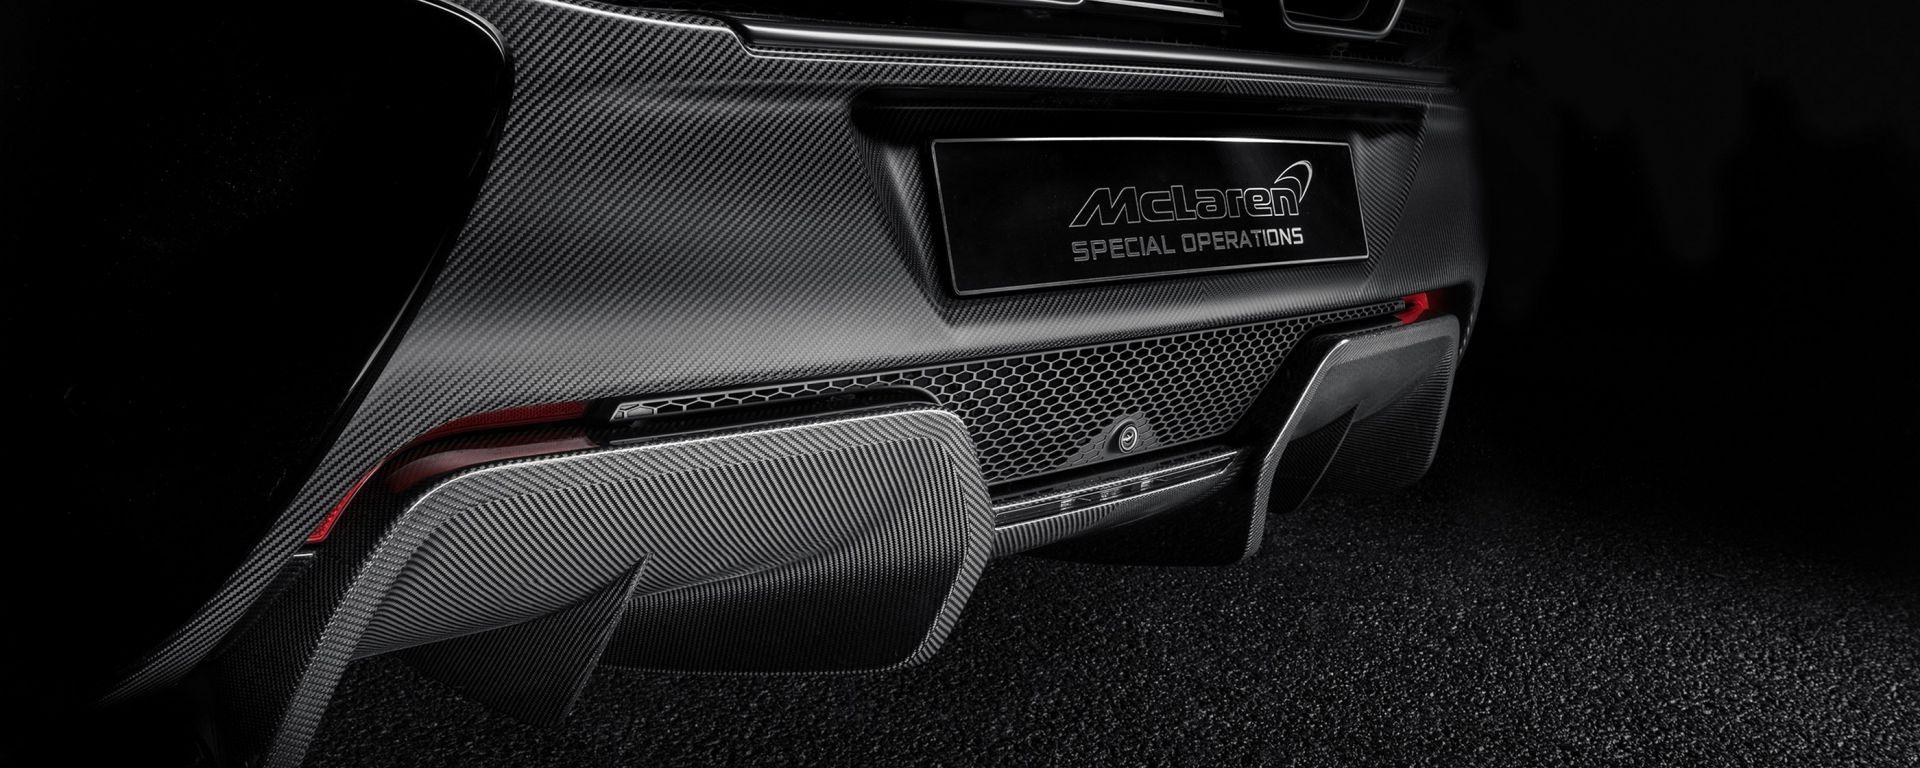 McLaren MSO 650S Coupé